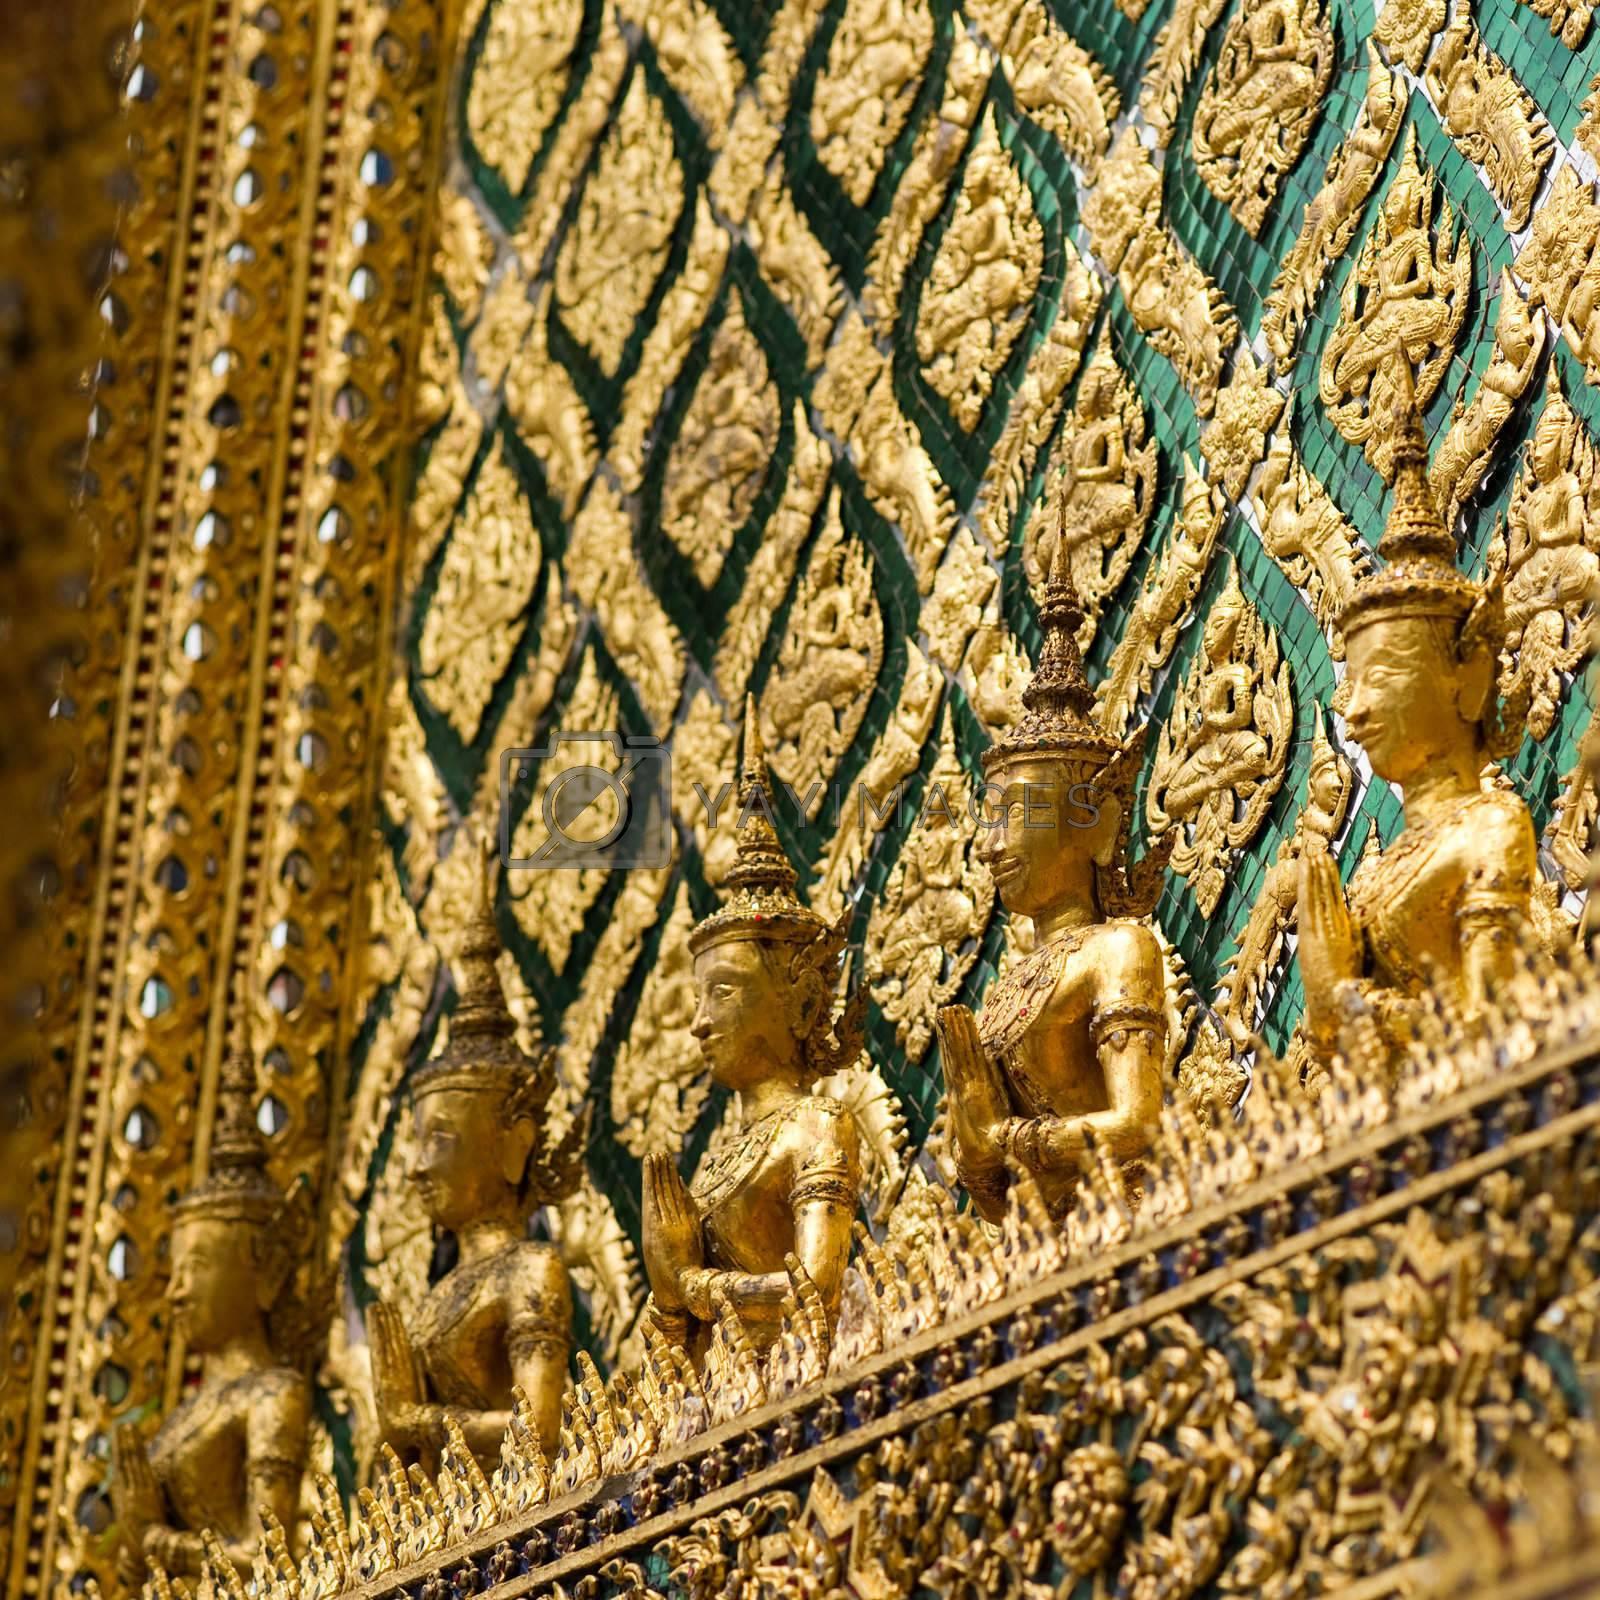 Ornamental wall in buddhist temple, Grand palace, Bangkok, Thailand